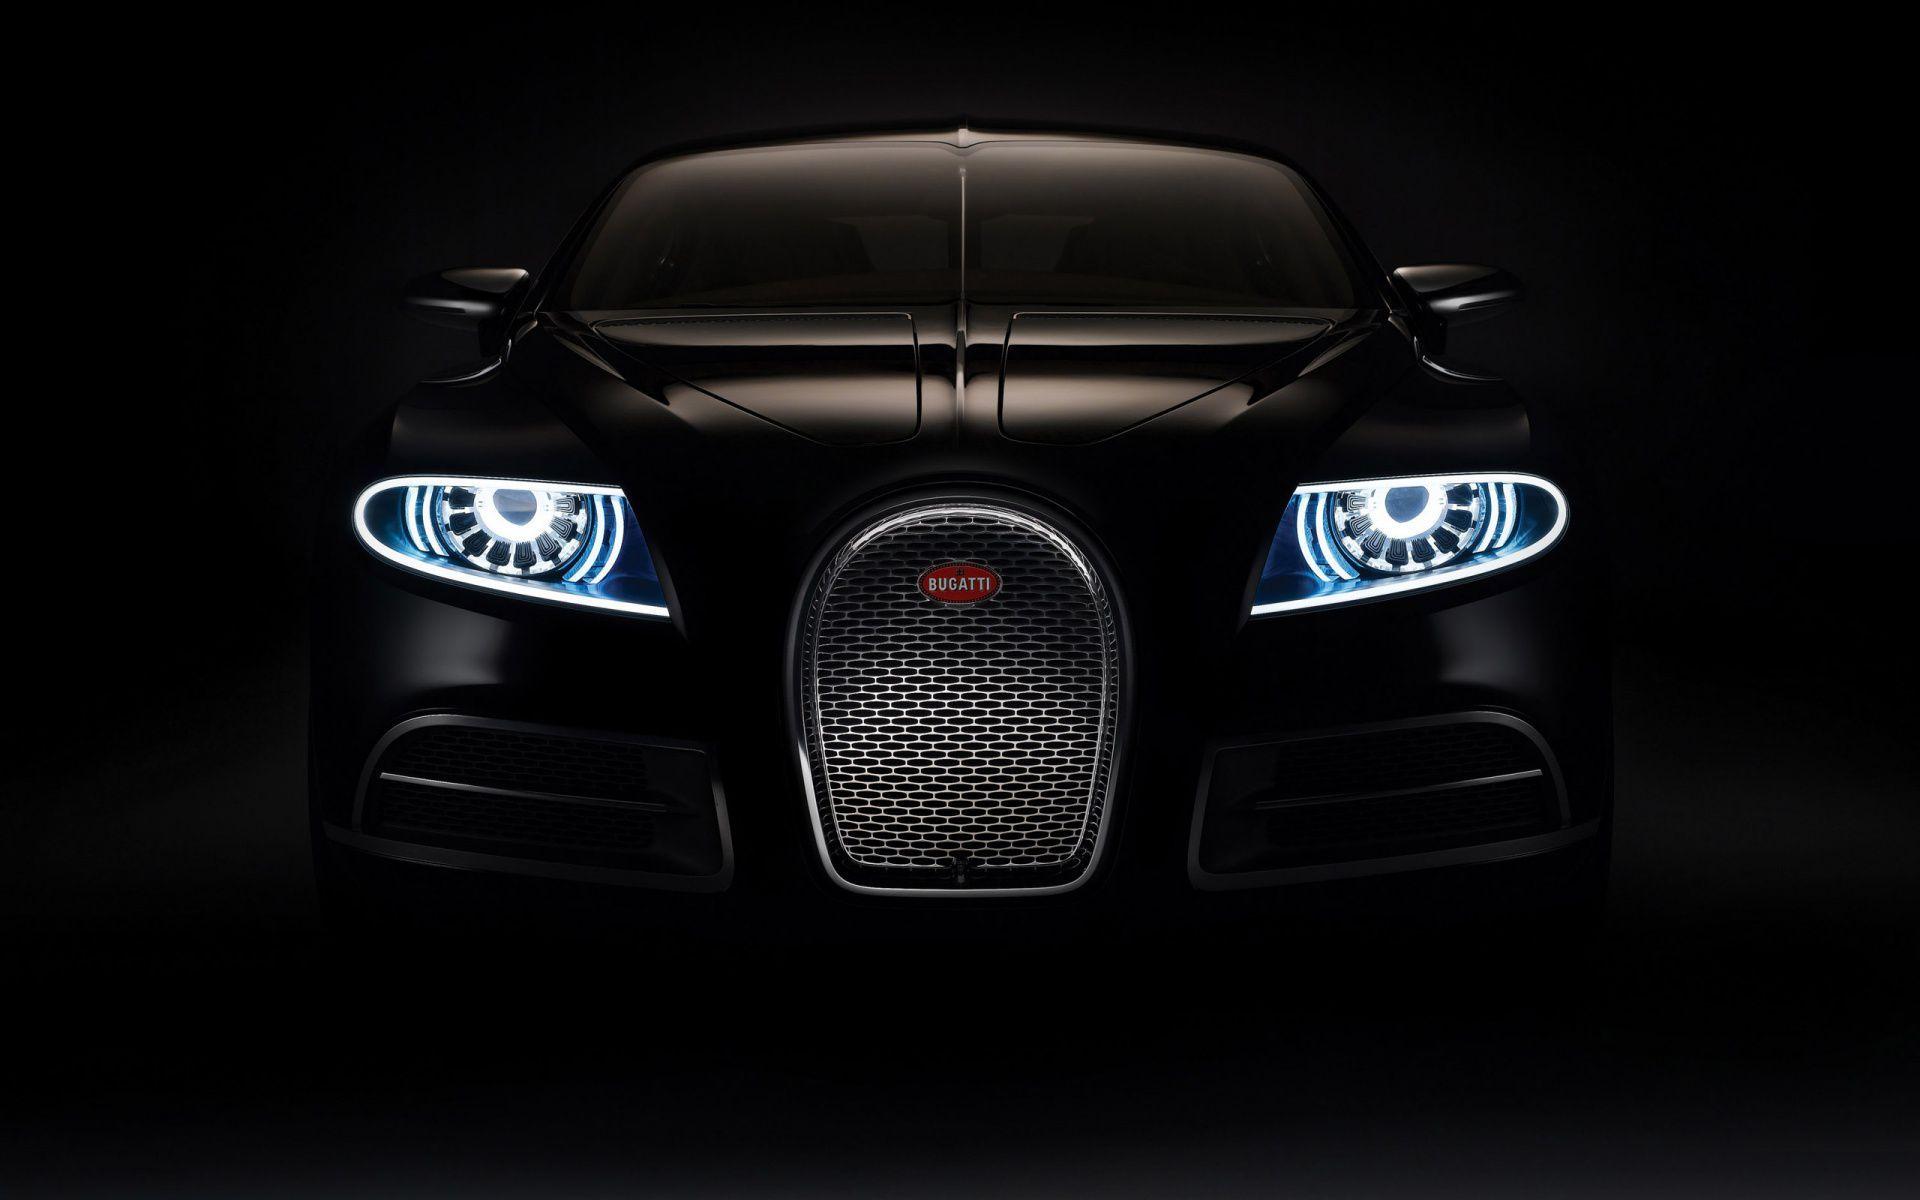 Black Car Front View Hd Wallpaper Bugatti Cars Super Sport Cars